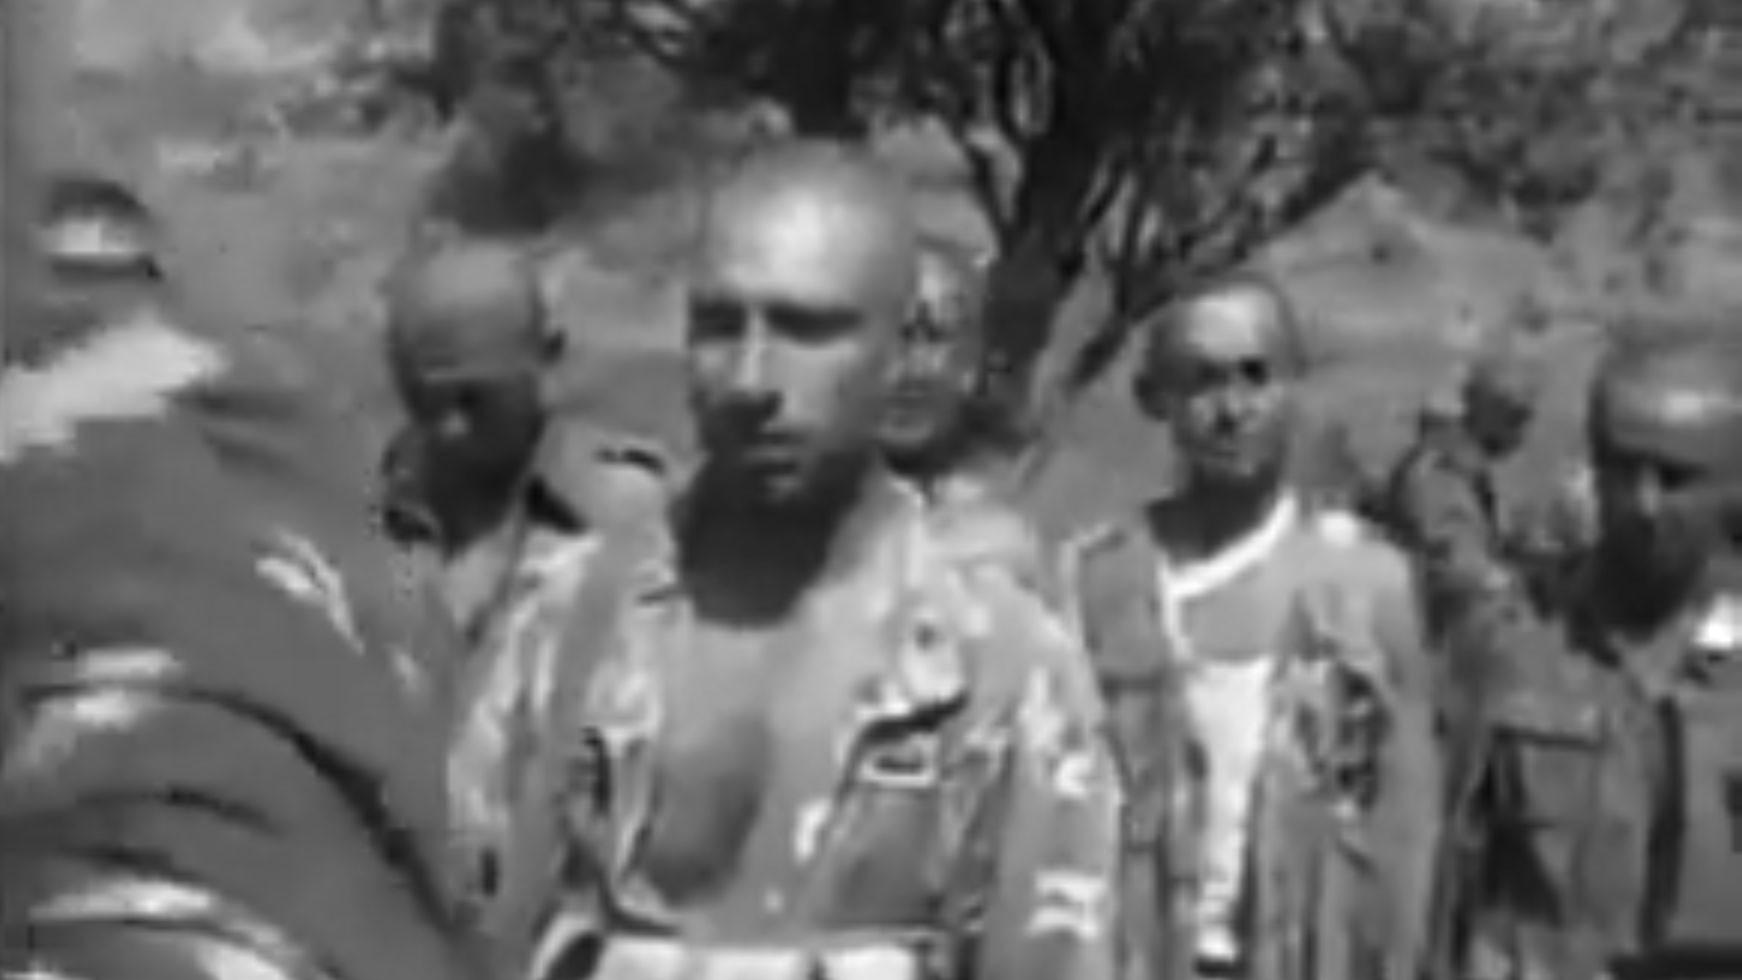 Лейтенант Андрей Мерзликин. Скриншот видео youtube/Ben-channel